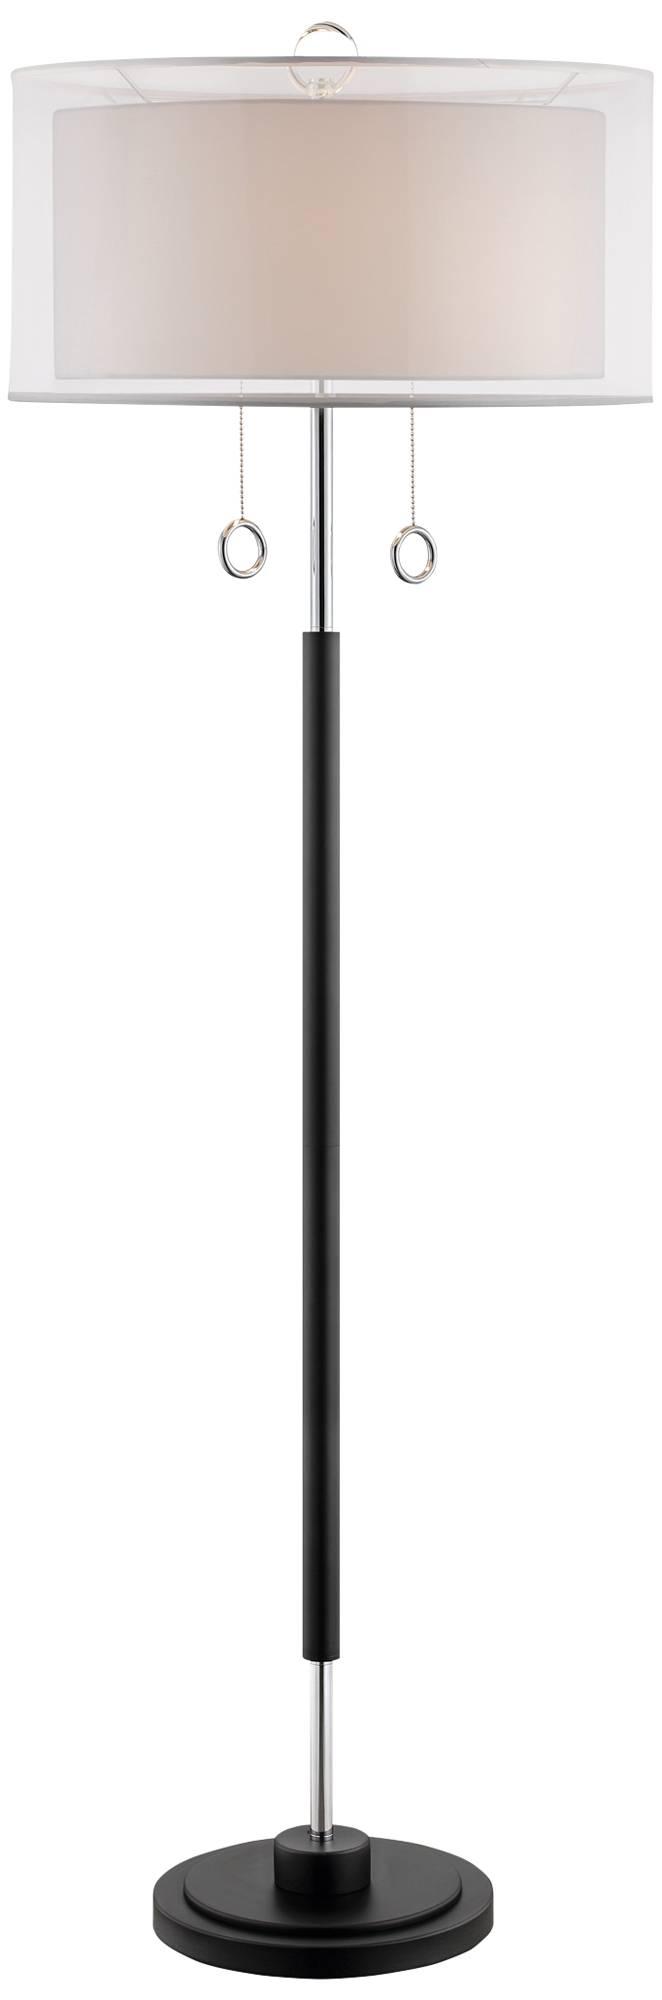 Sonneman Zylinder Chrome And Black Floor Lamp H0616